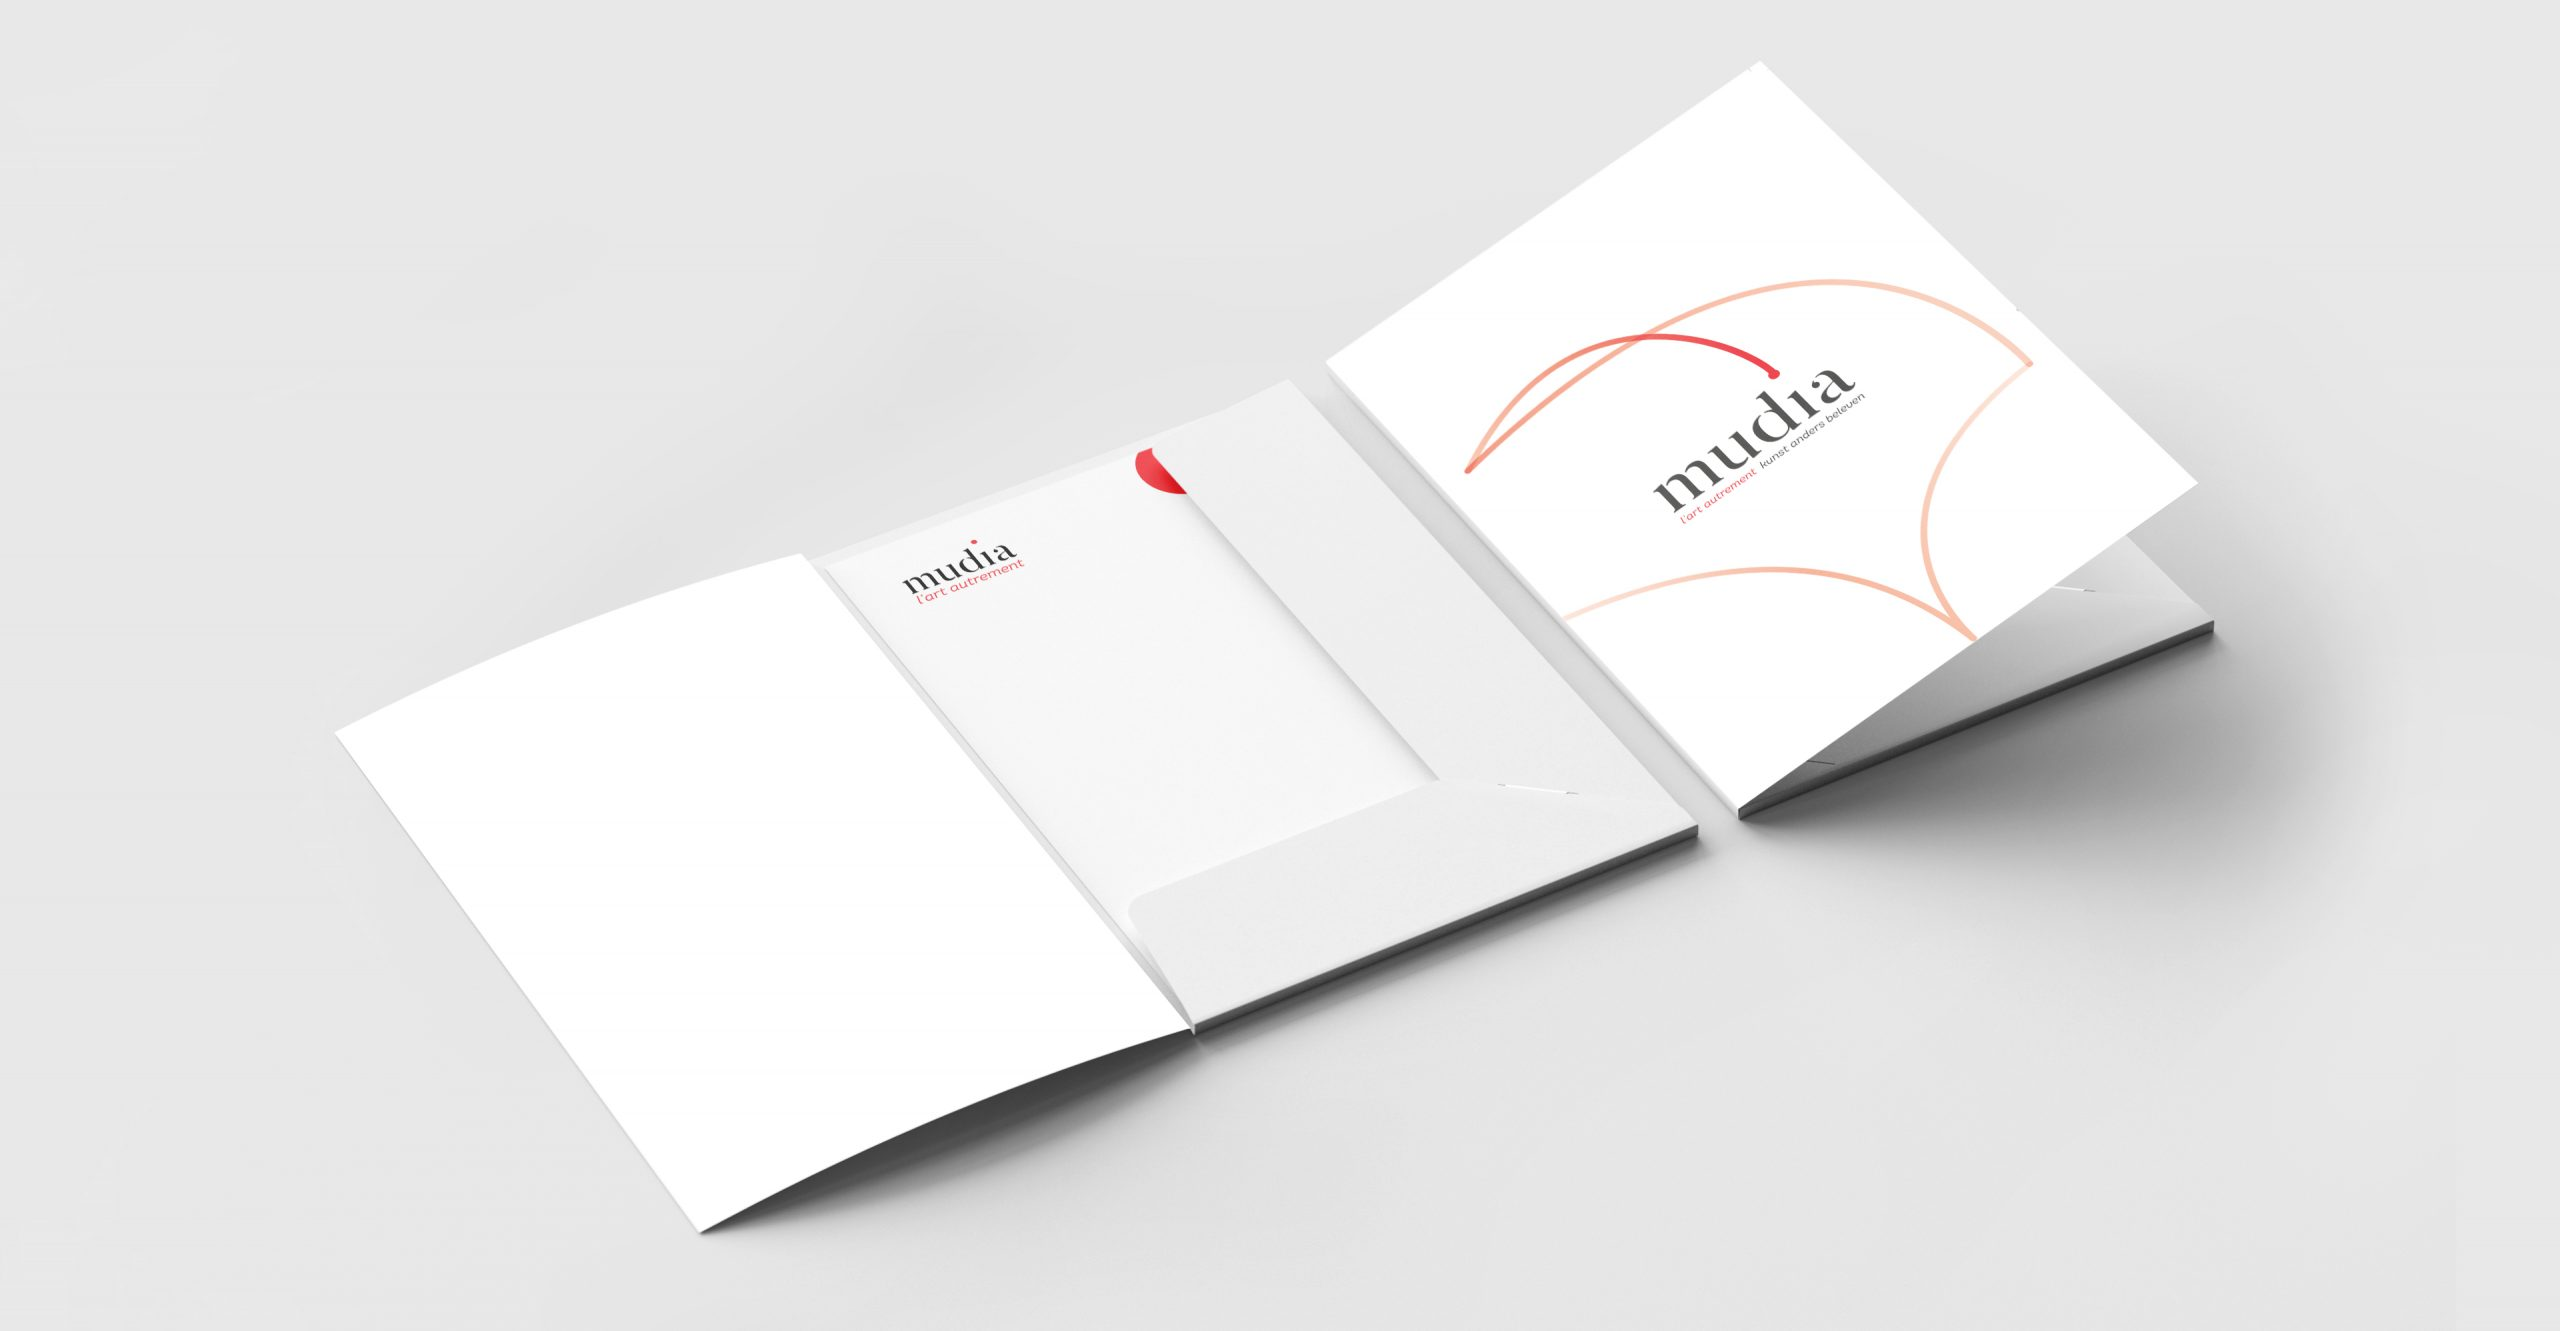 Branding of a folder